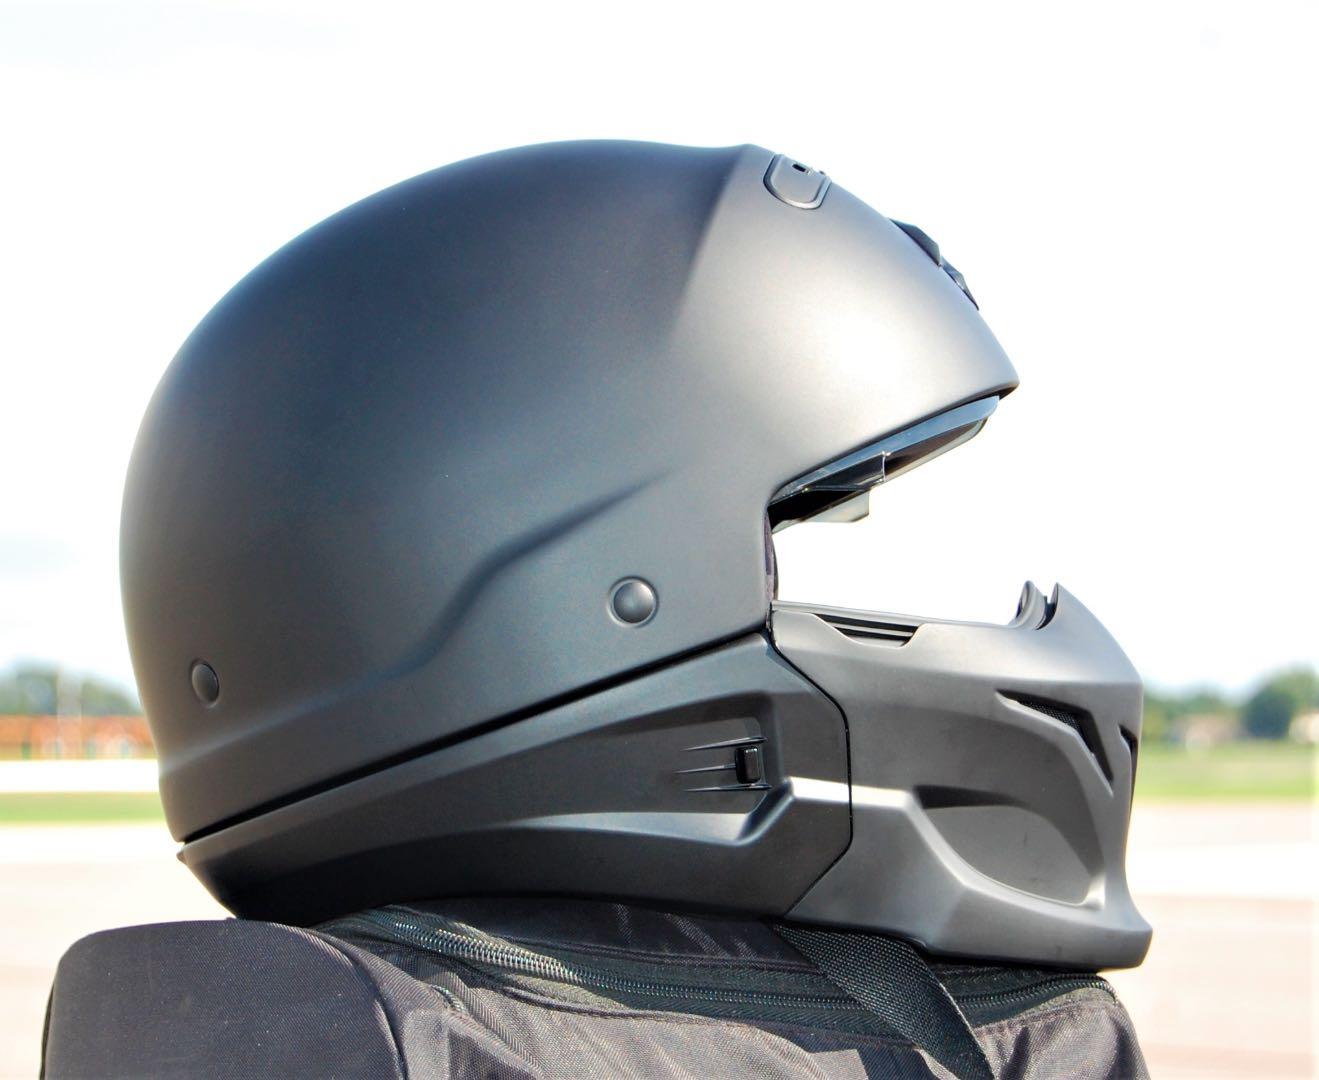 Scorpion Covert 3-in-1 Helmet testing